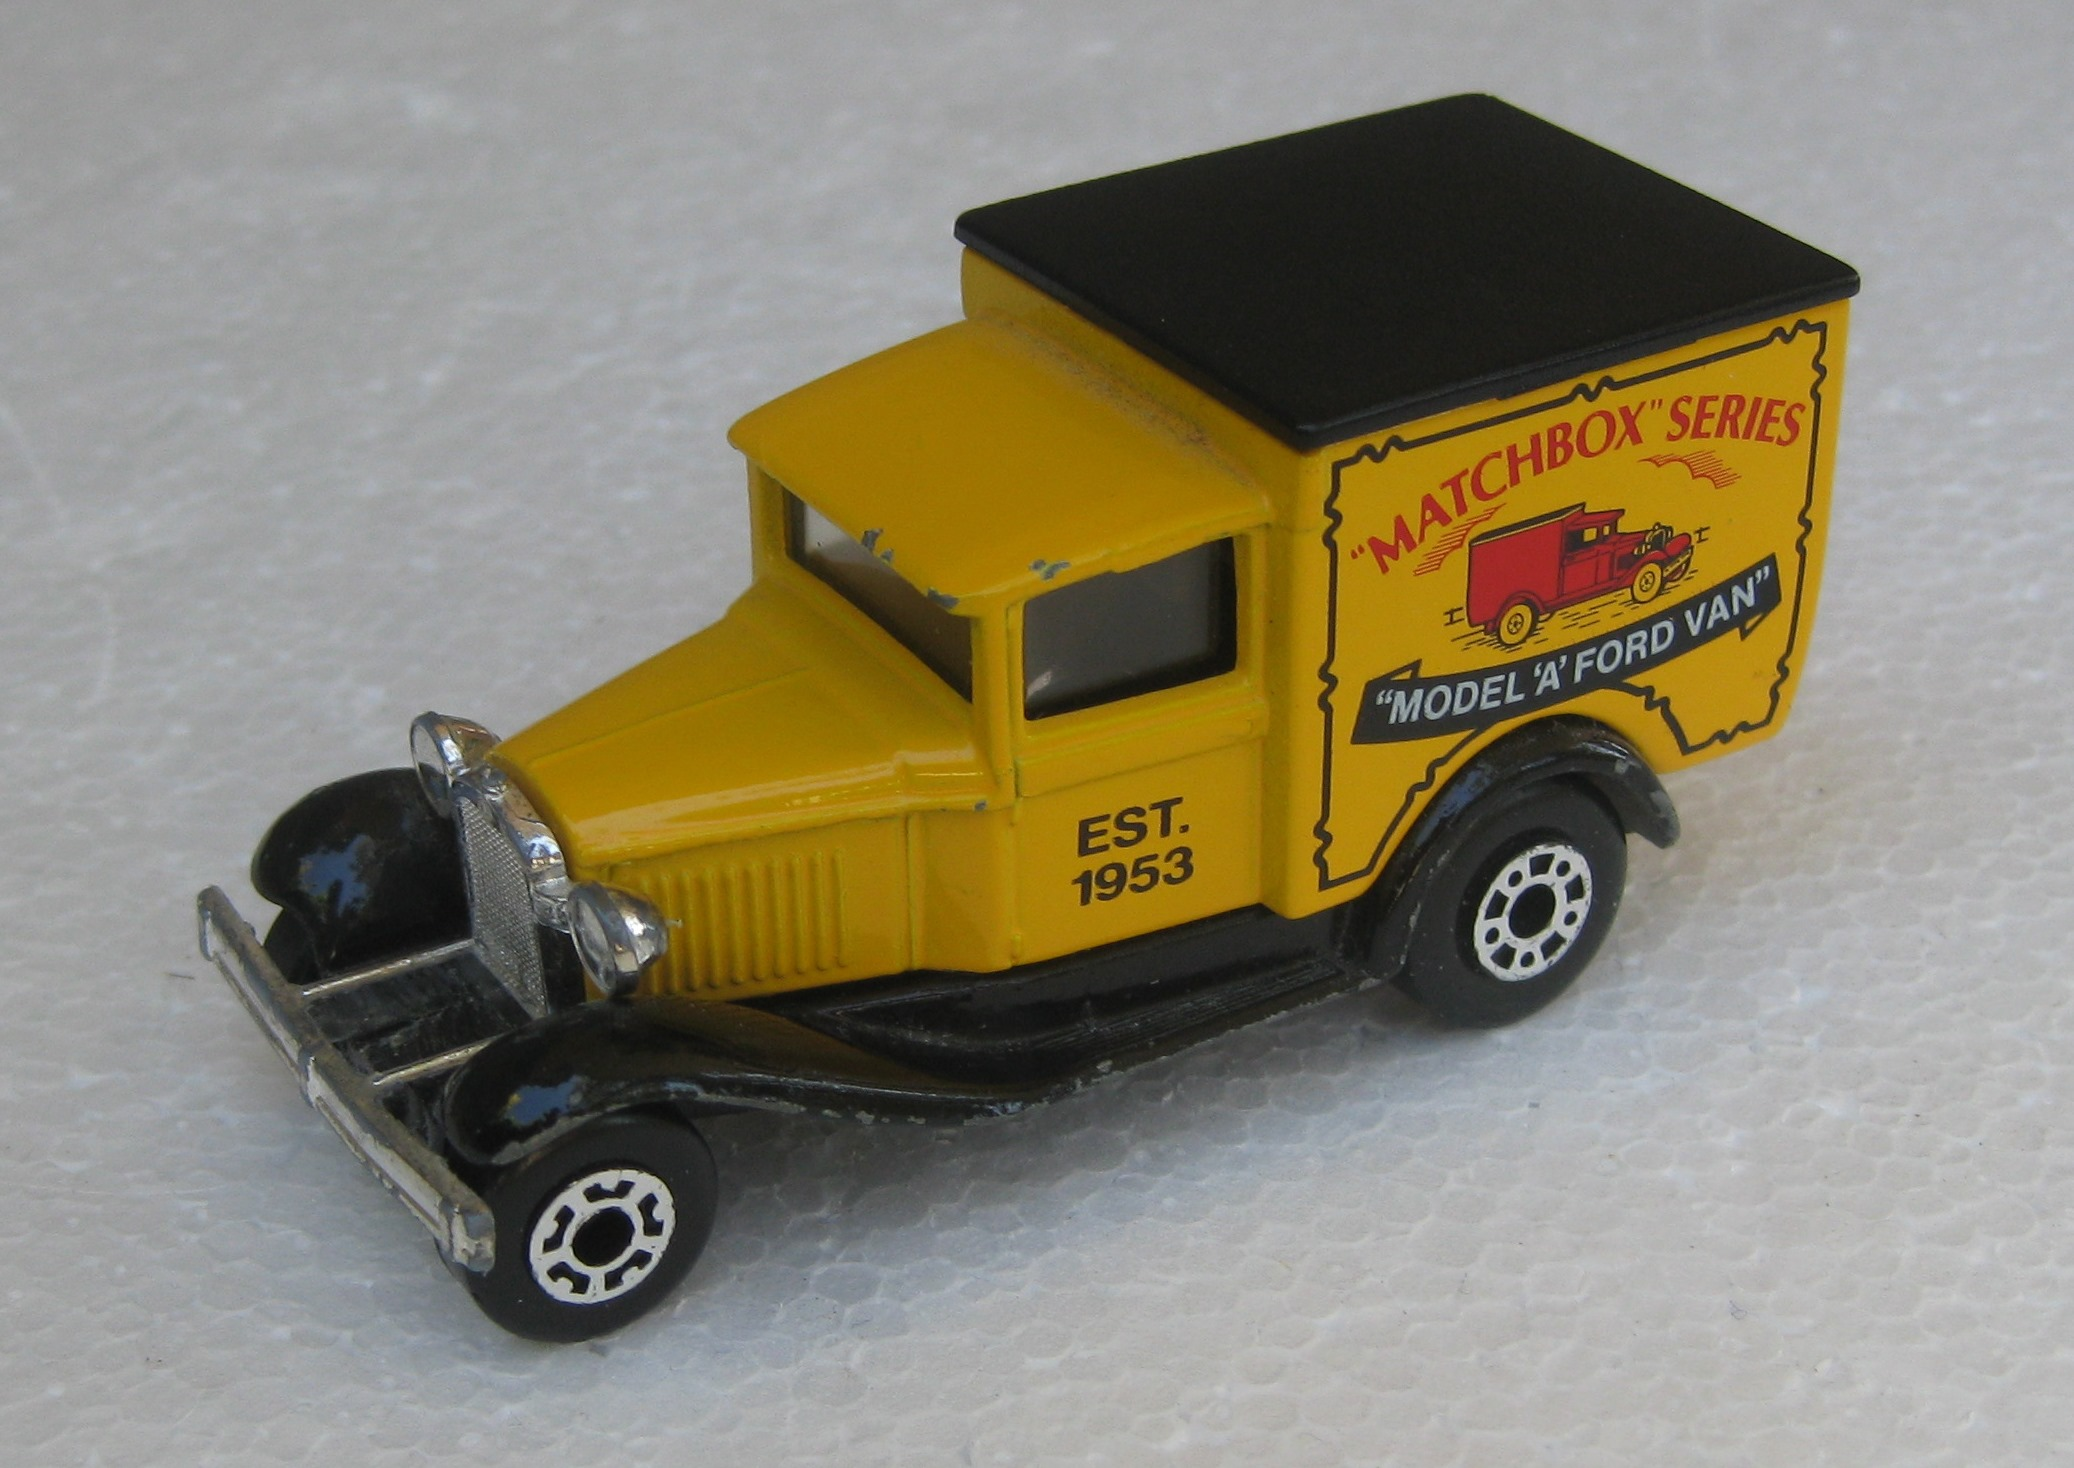 Model A Ford (MB038, Matchbox Series).JPG